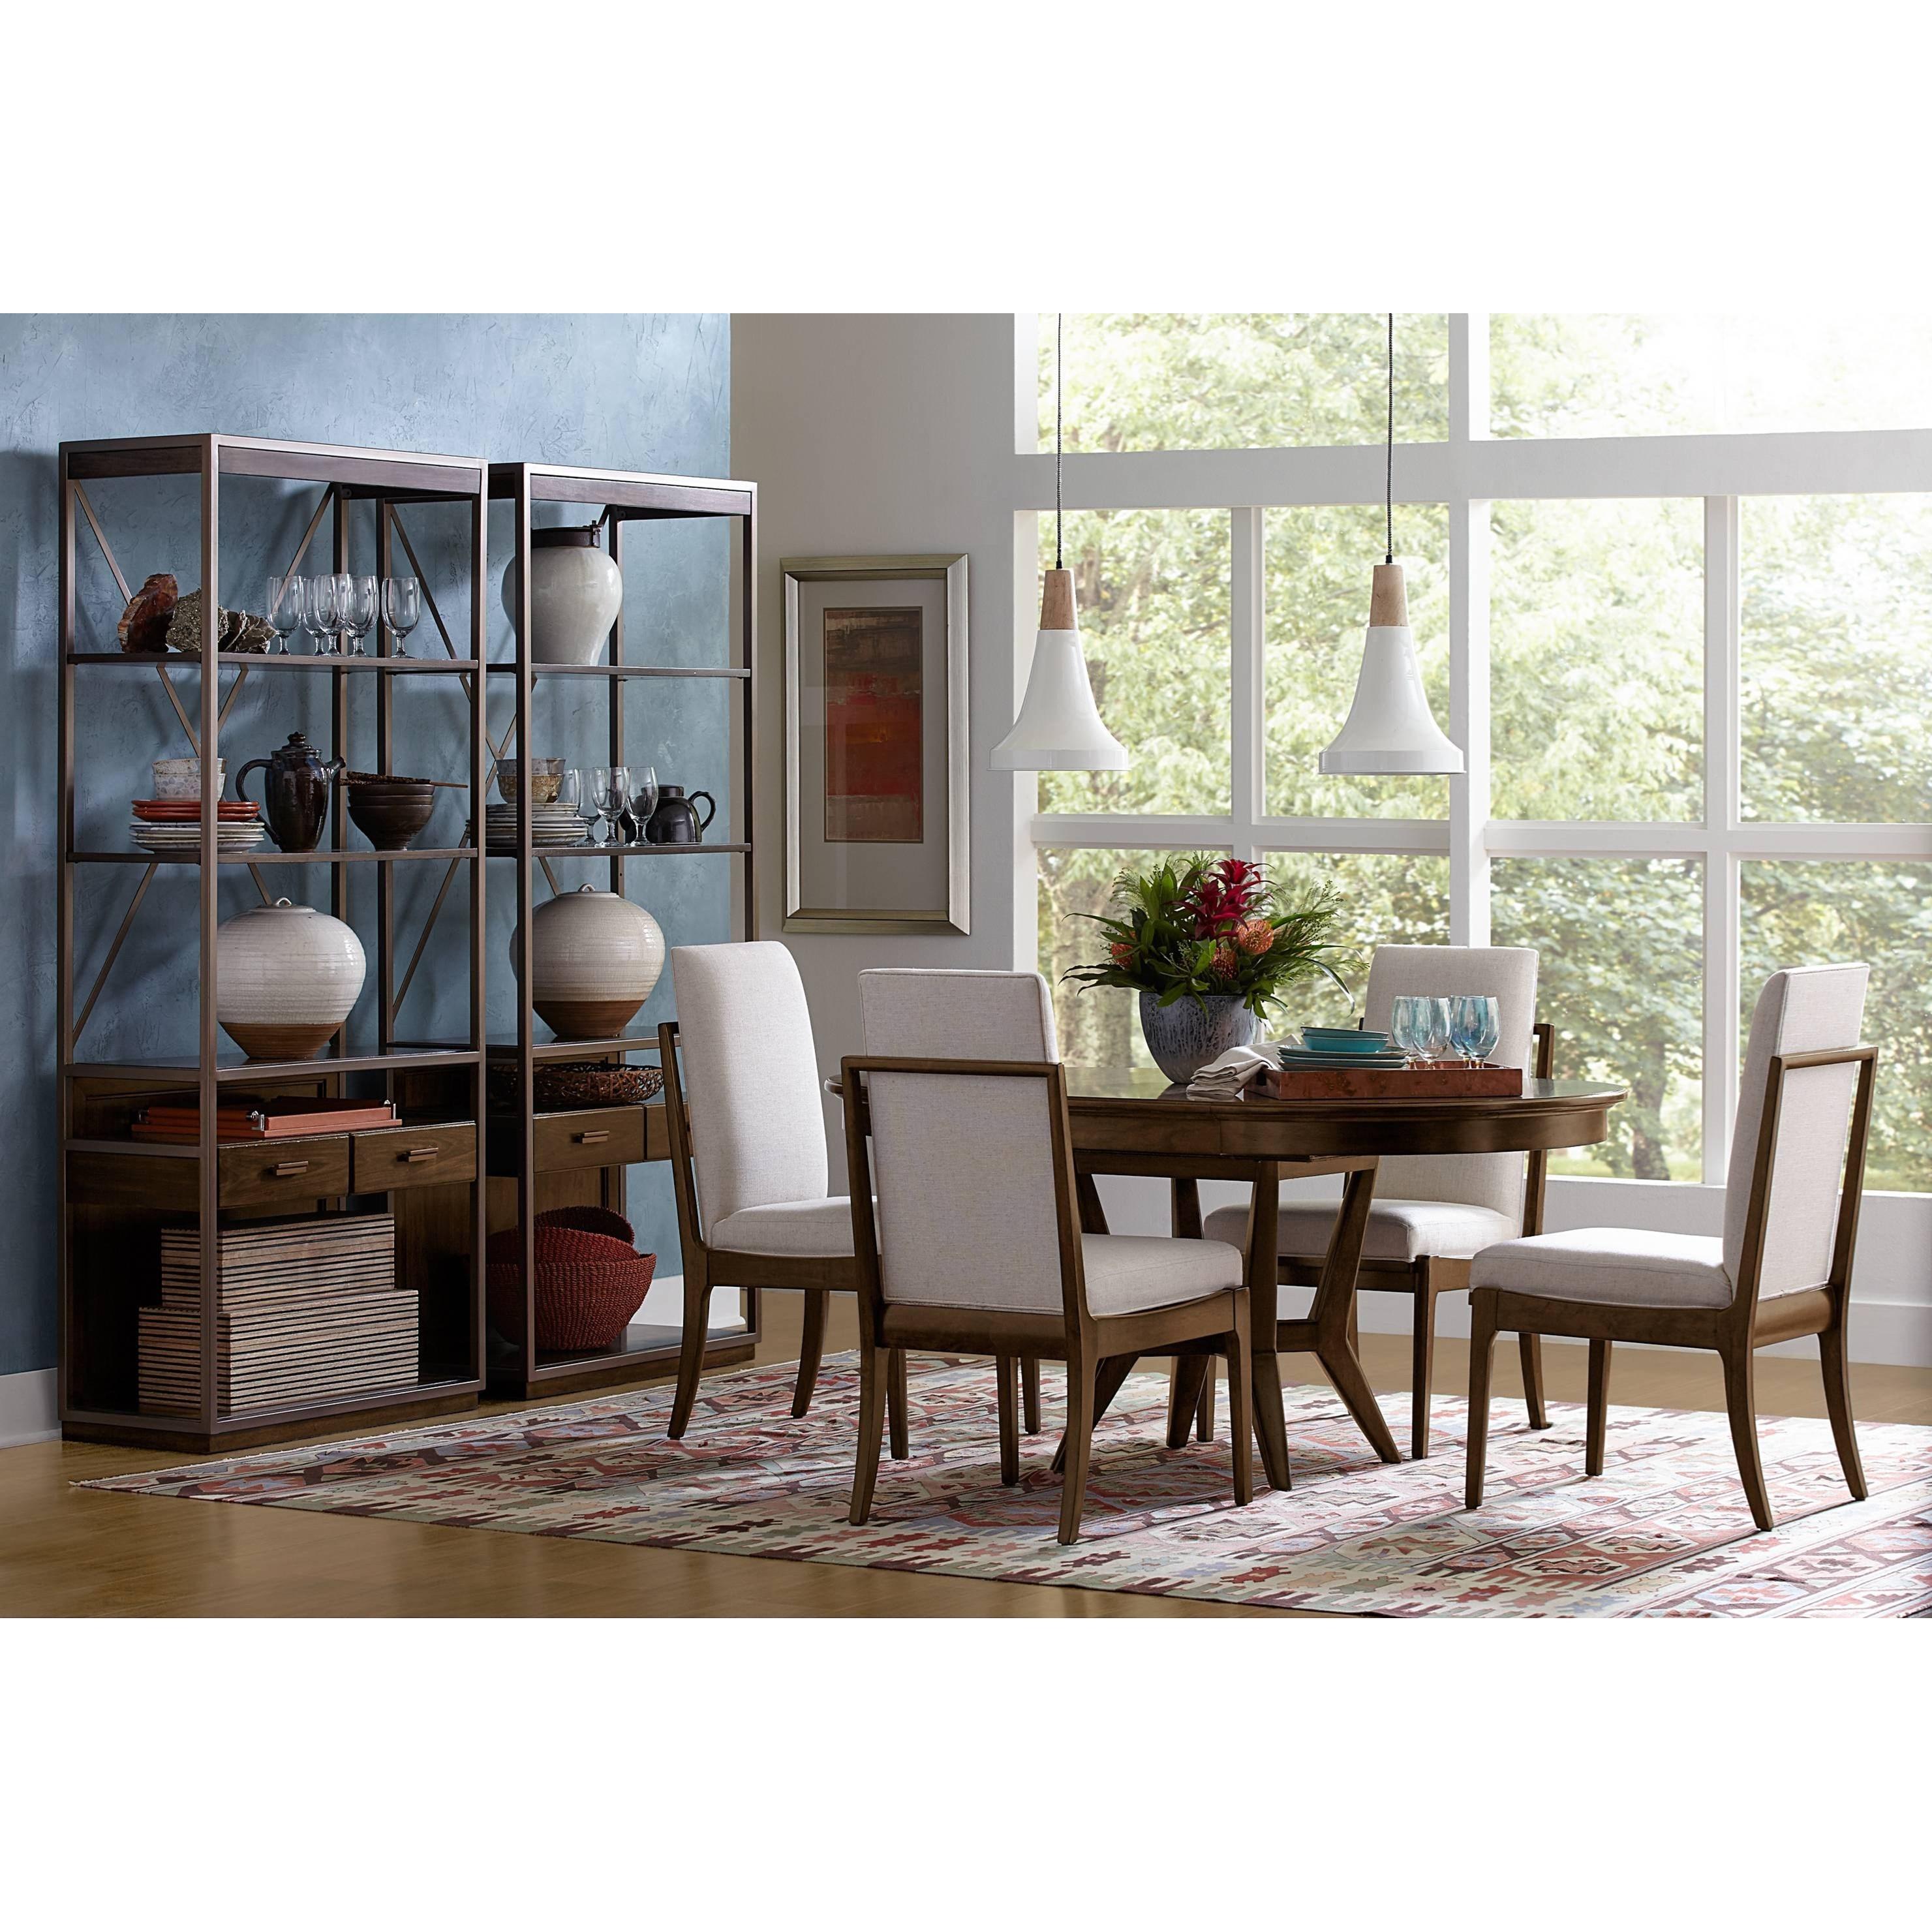 dining room groups stanley furniture santa clara casual dining room